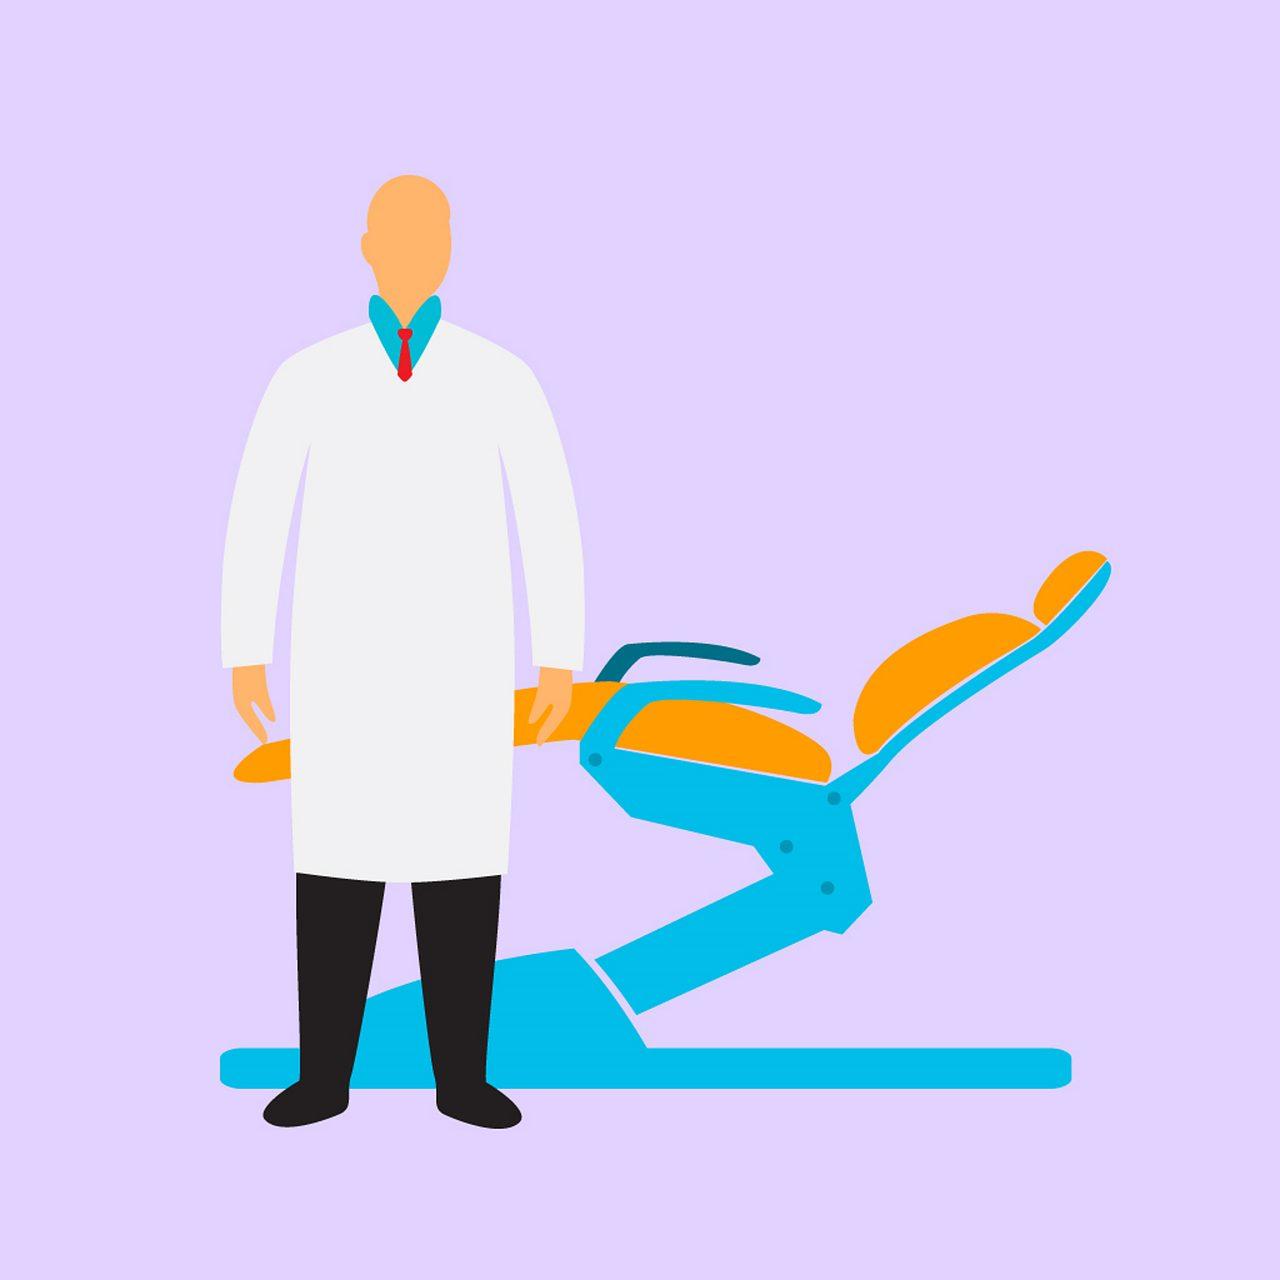 Groof A W de tandarts lachgas